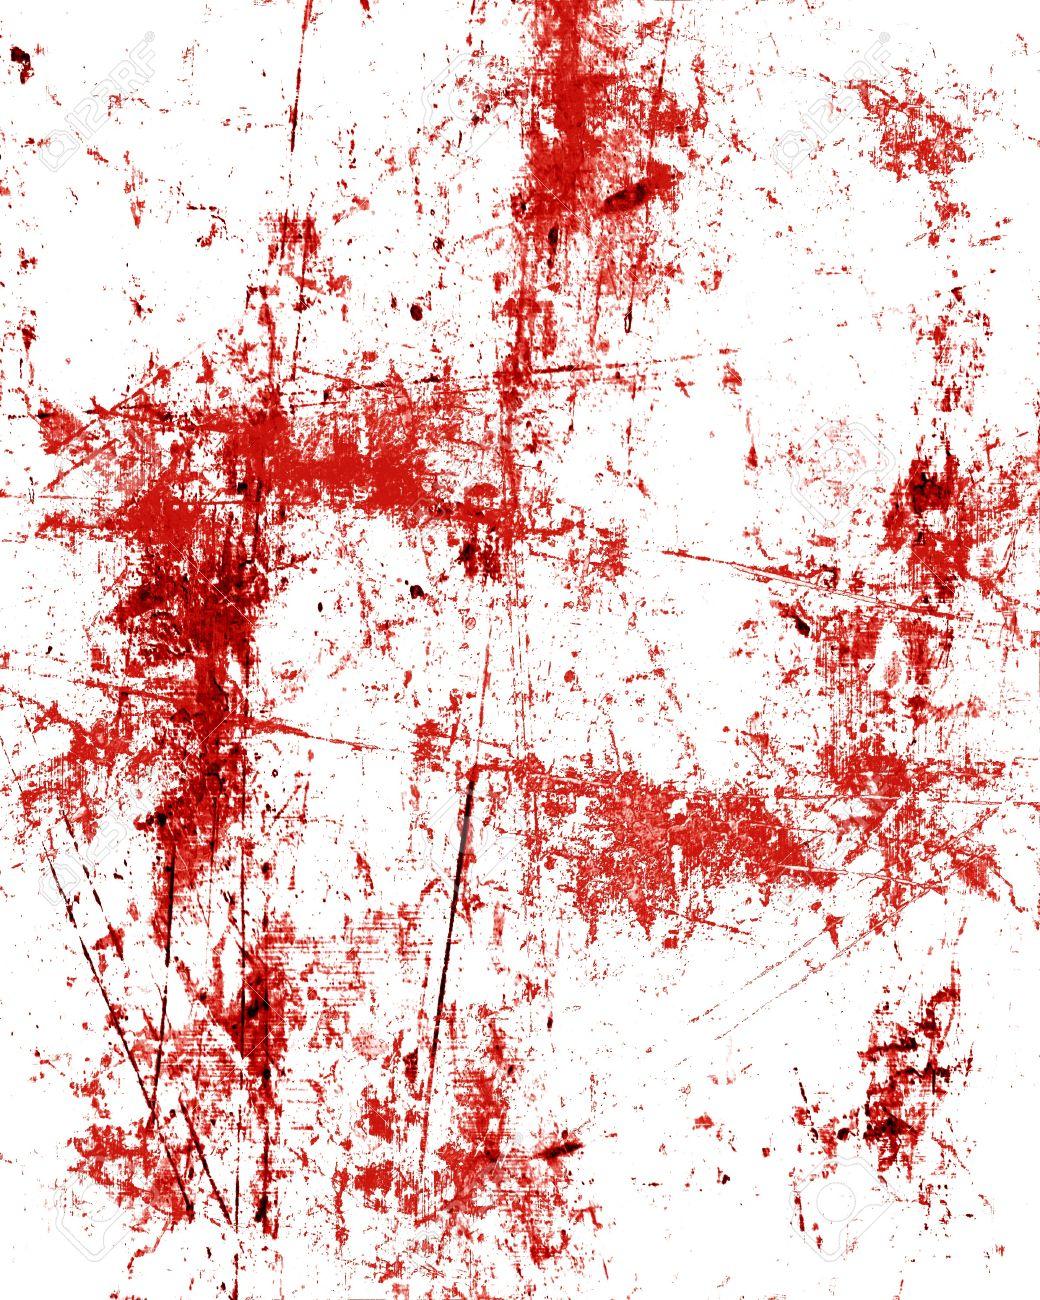 Red Blood Splatter On A Grunge Like Background Stock Photo ...